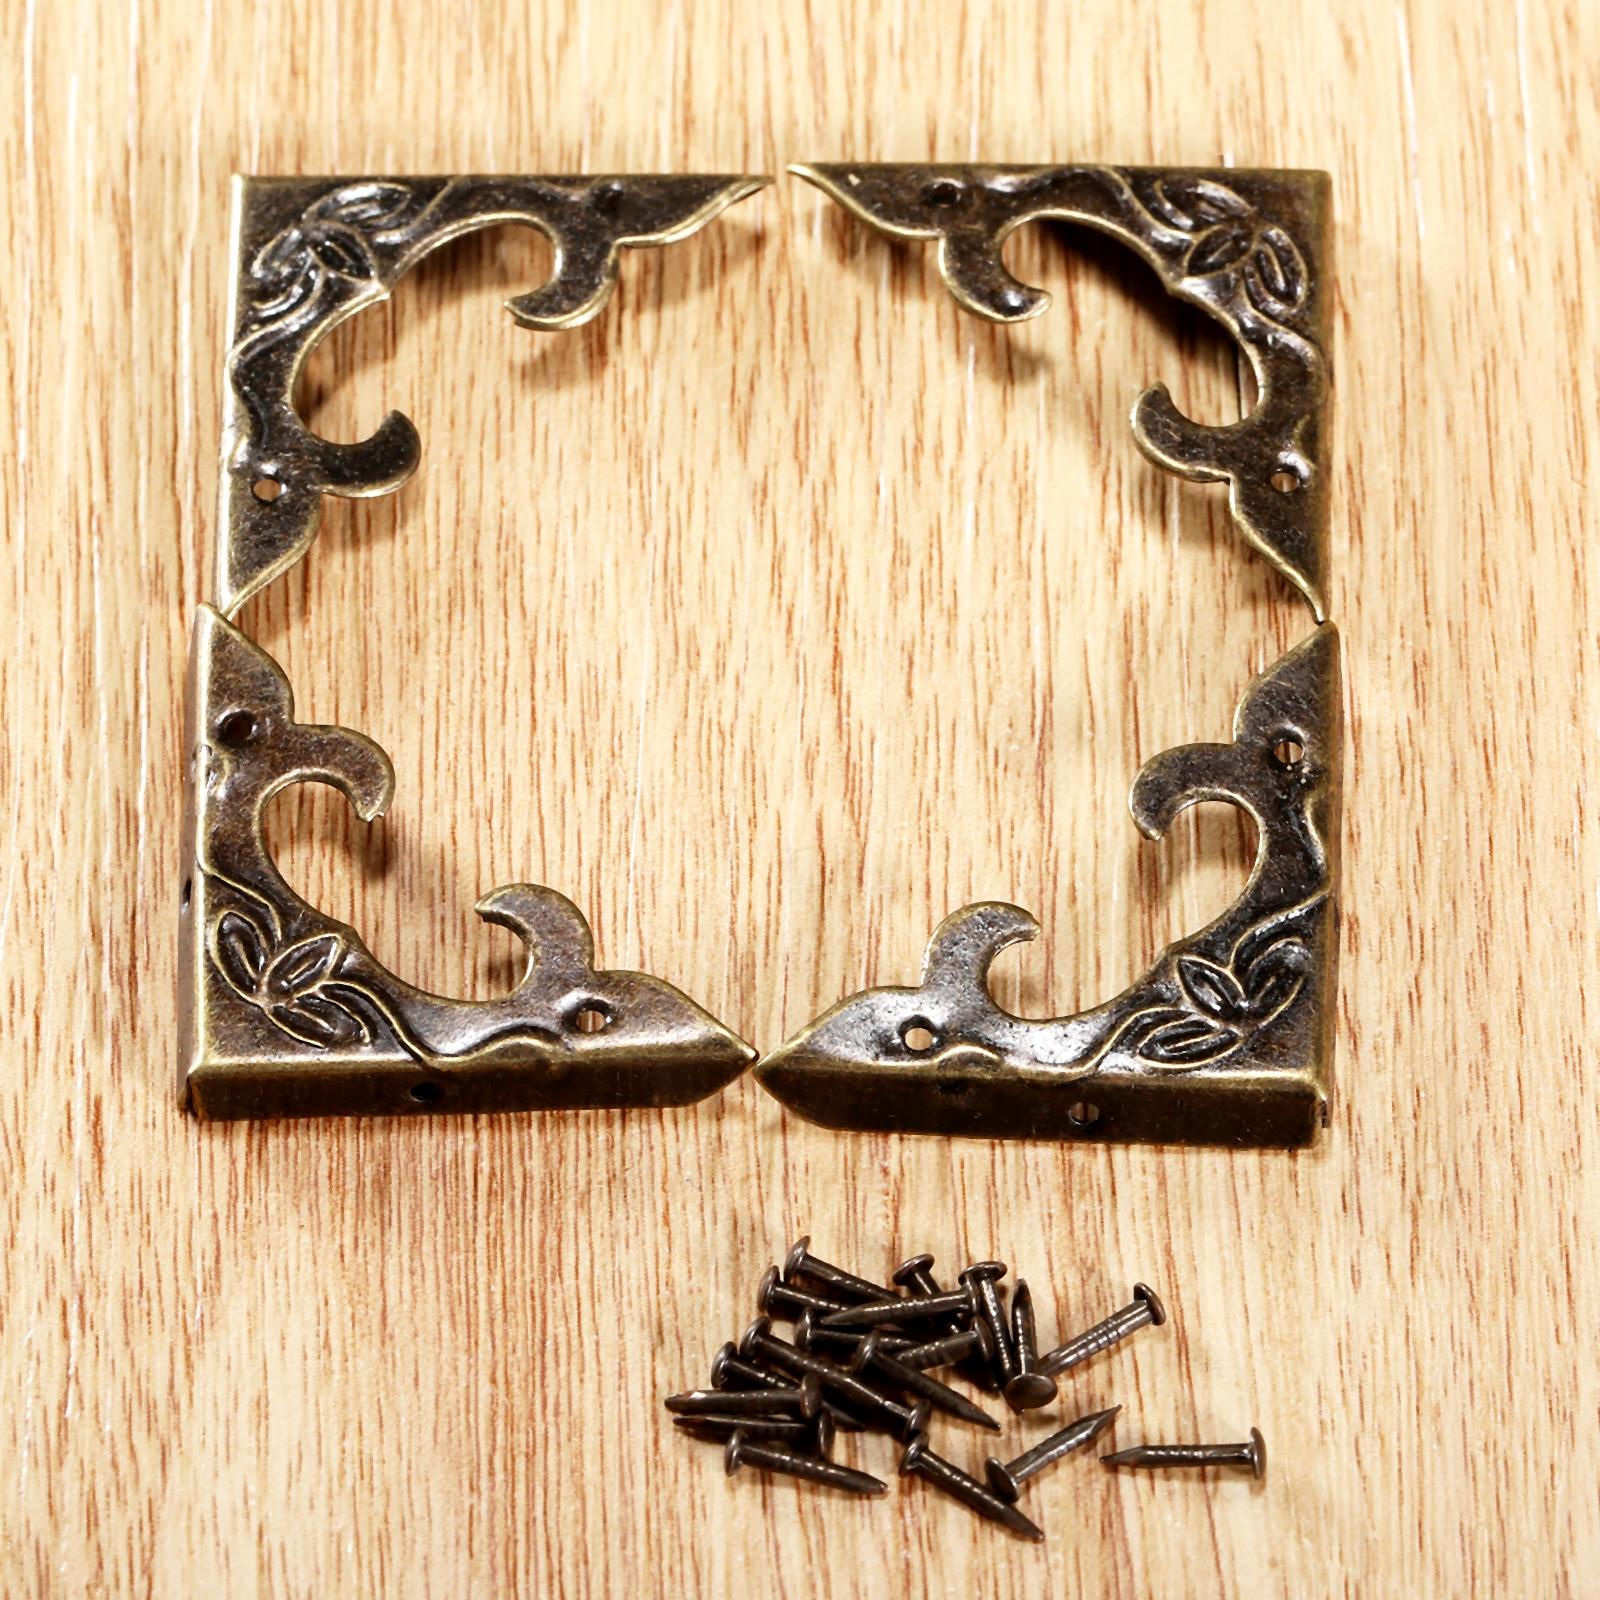 DRELD 4Pcs Antique Furniture Corner Brackets Jewelry Gift Box Wood ...